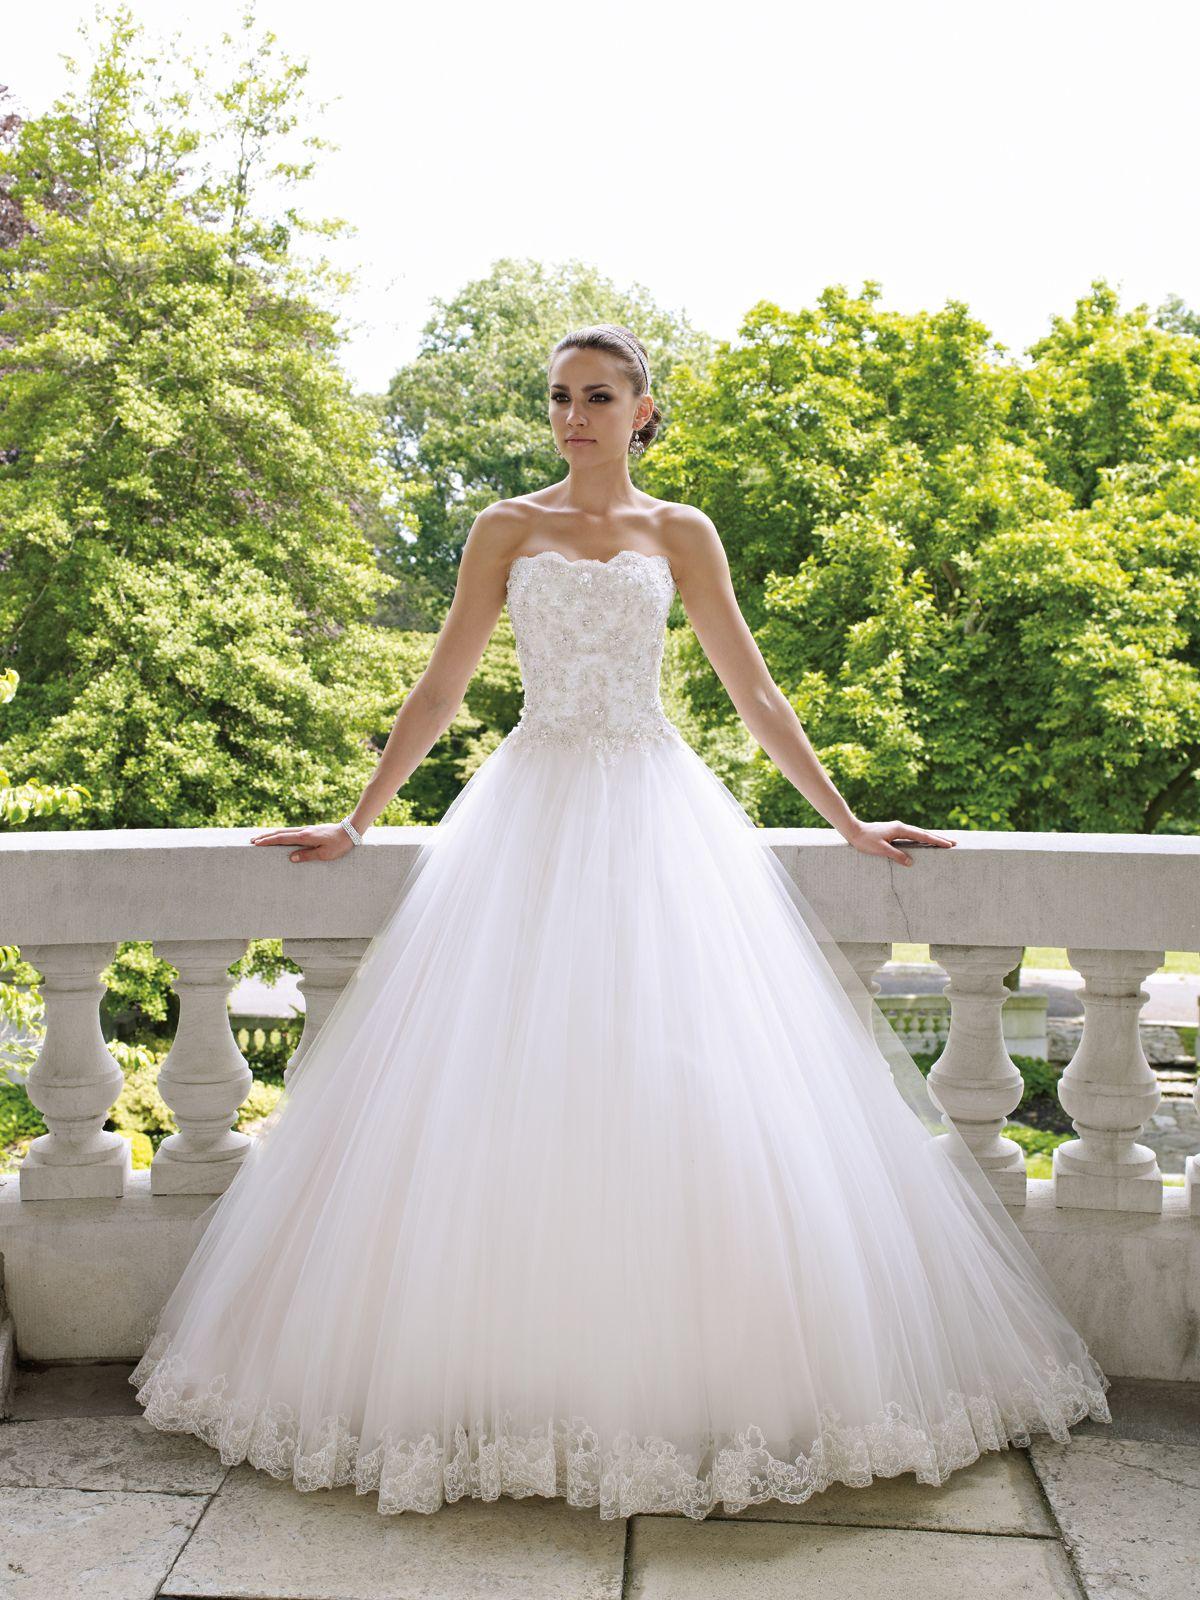 Wedding Dresses With Pink Accents - Ocodea.com